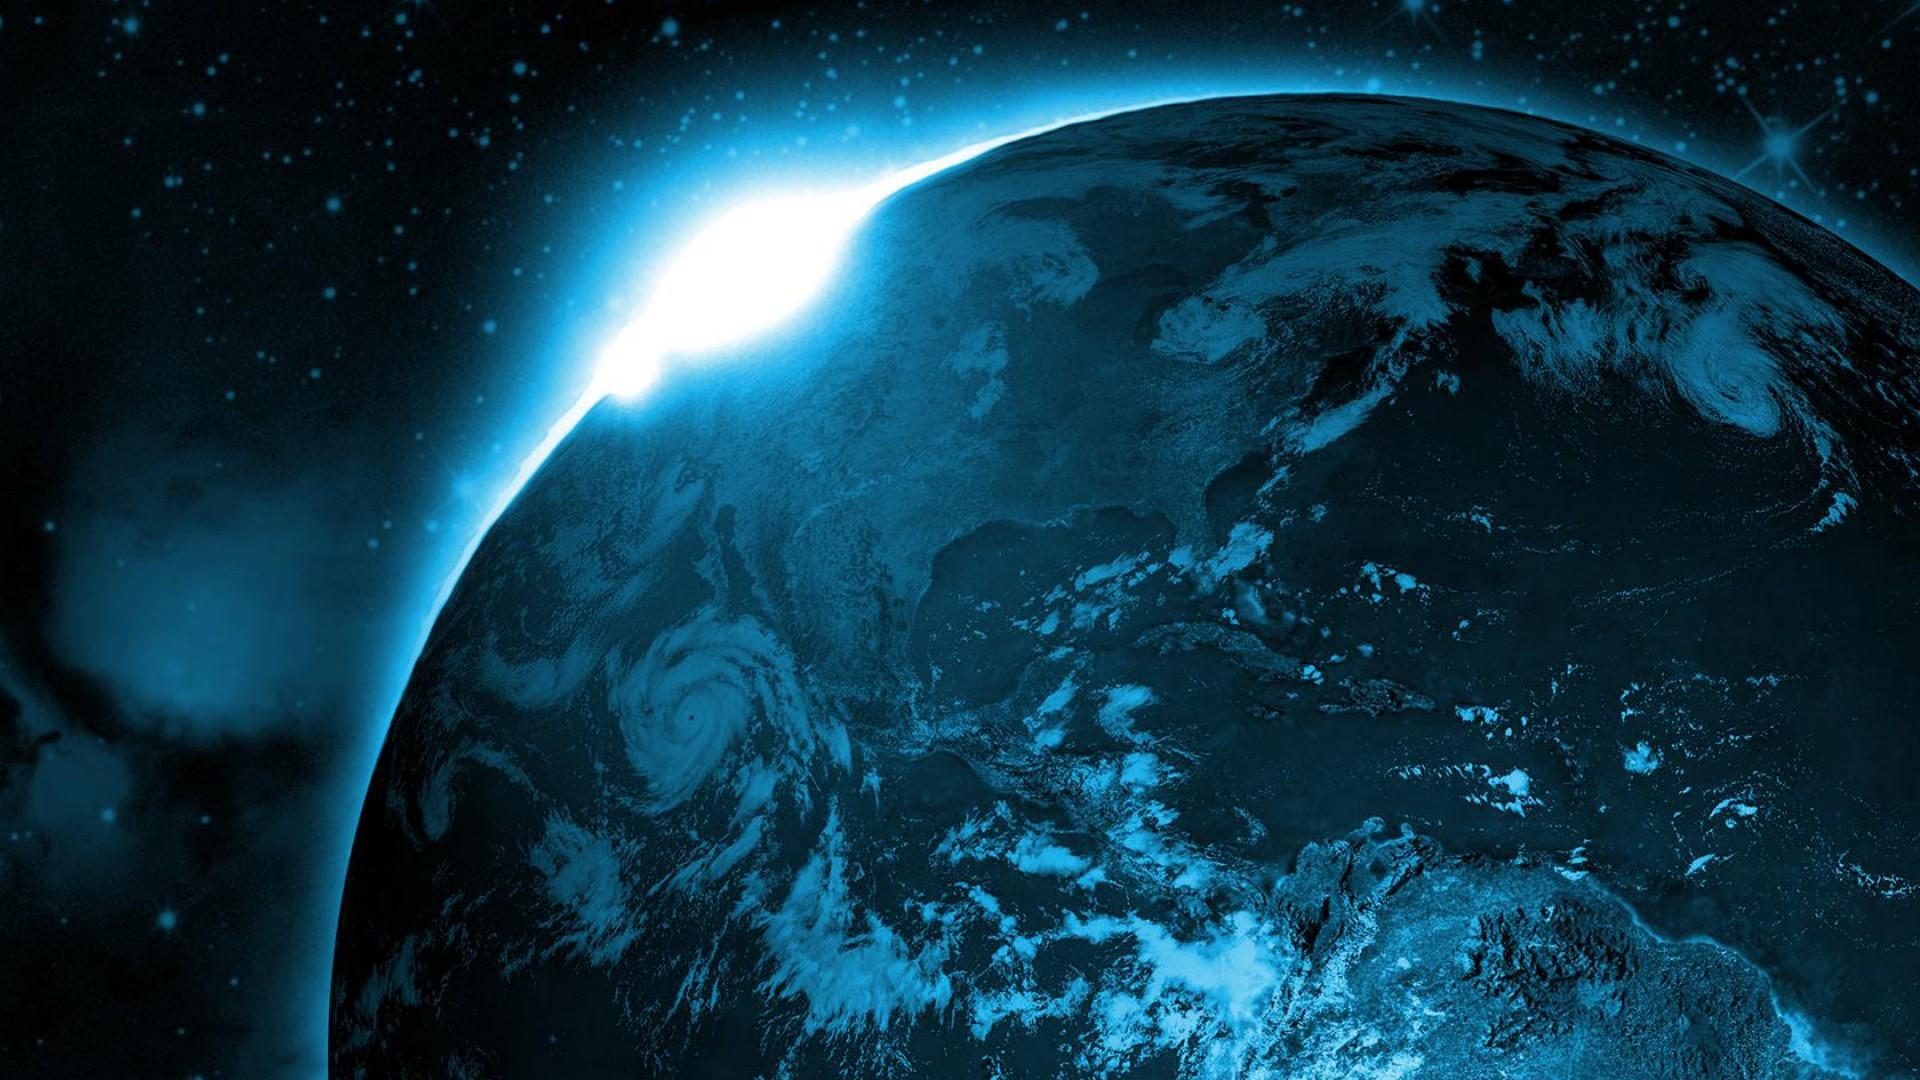 Earth Wallpaper Hd 1080p